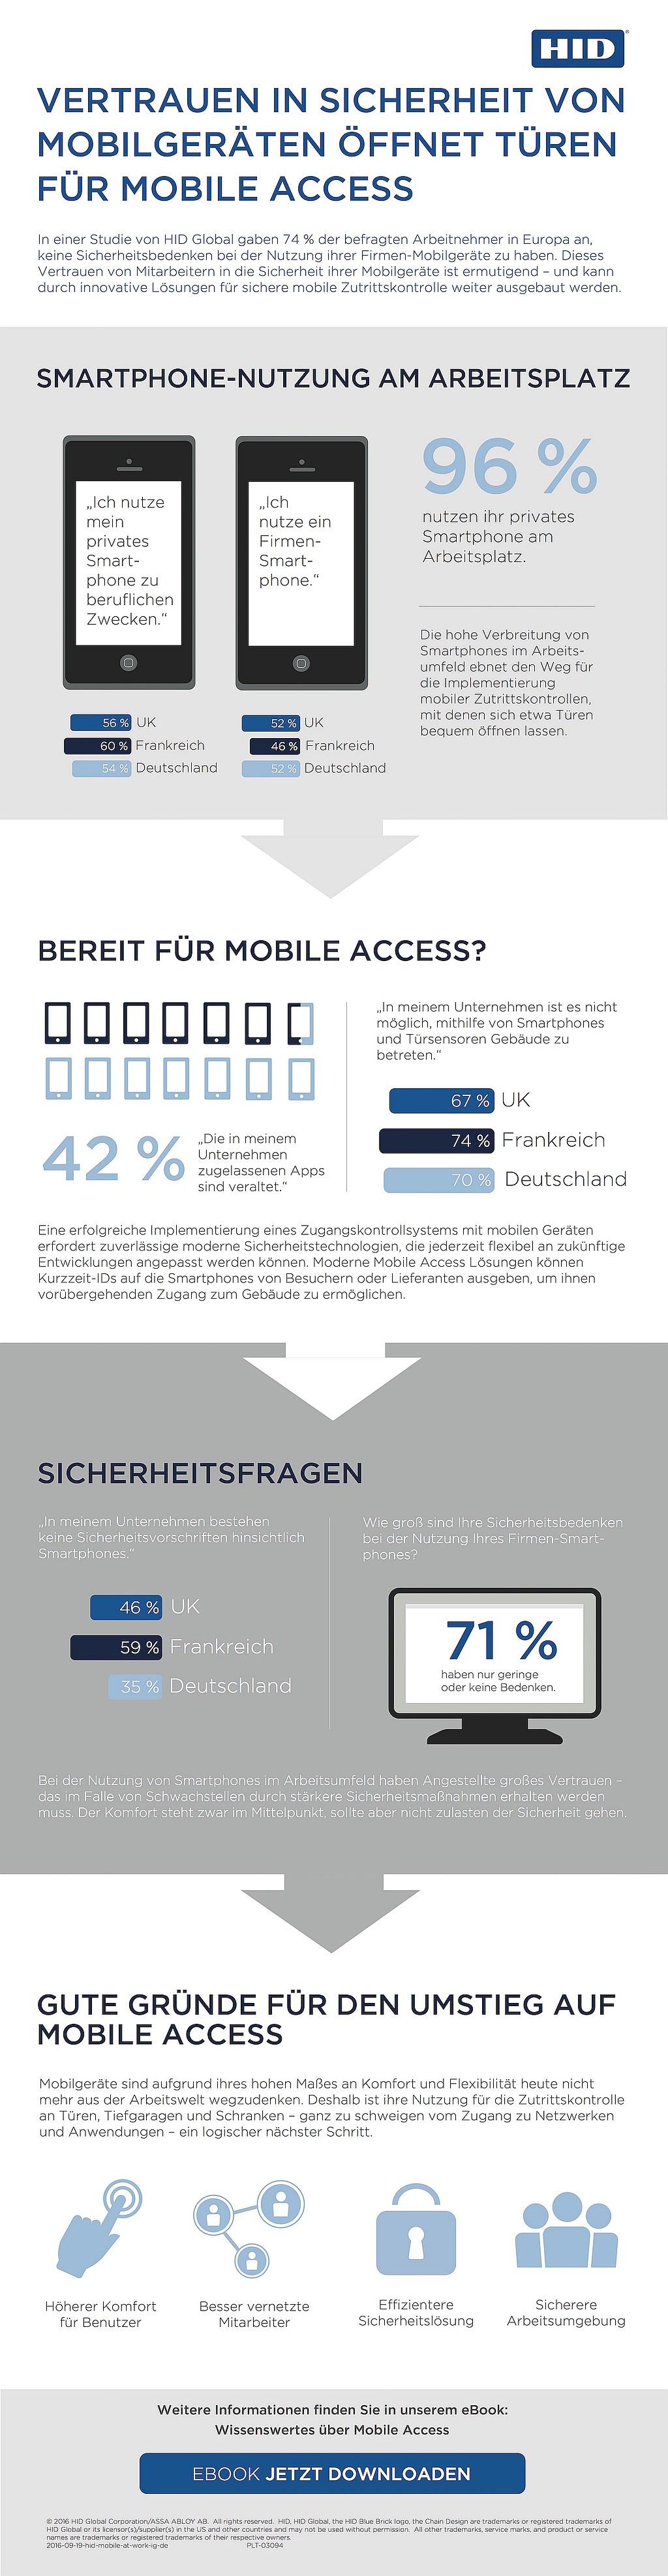 infografik-hid-smartphone-mobile-access